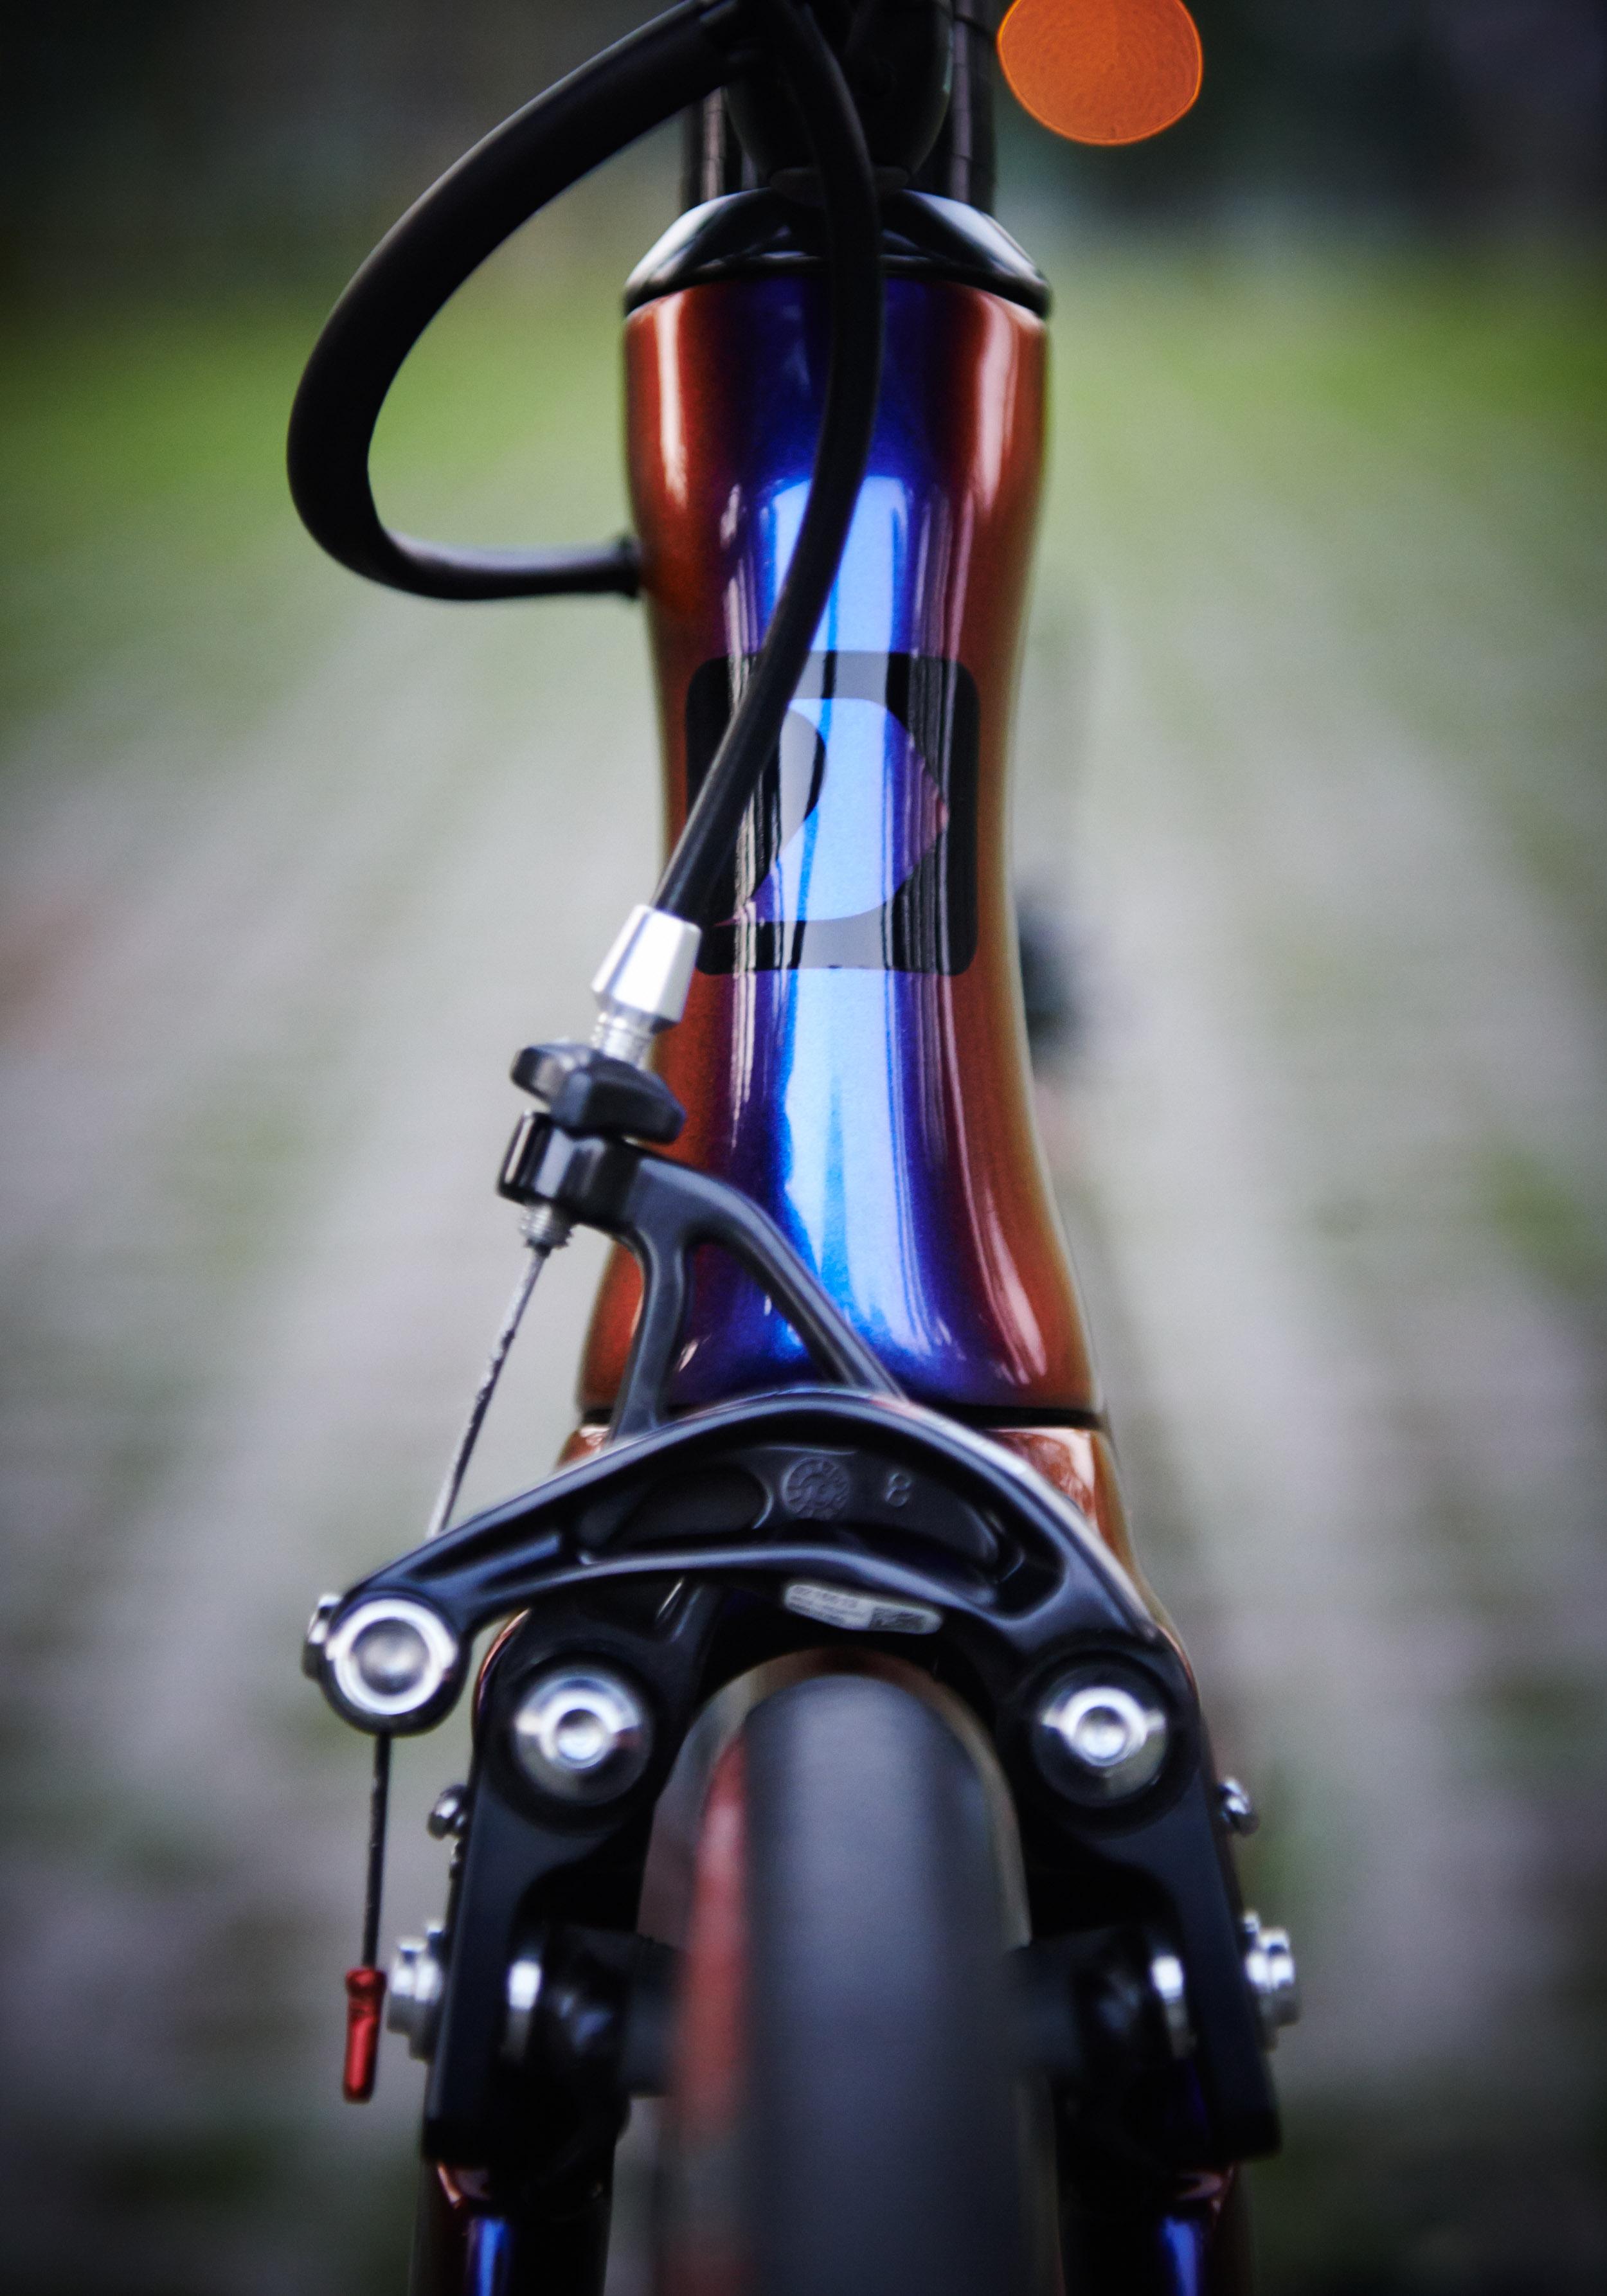 to-be-determined-garneau-a1-bike-review-128.jpg